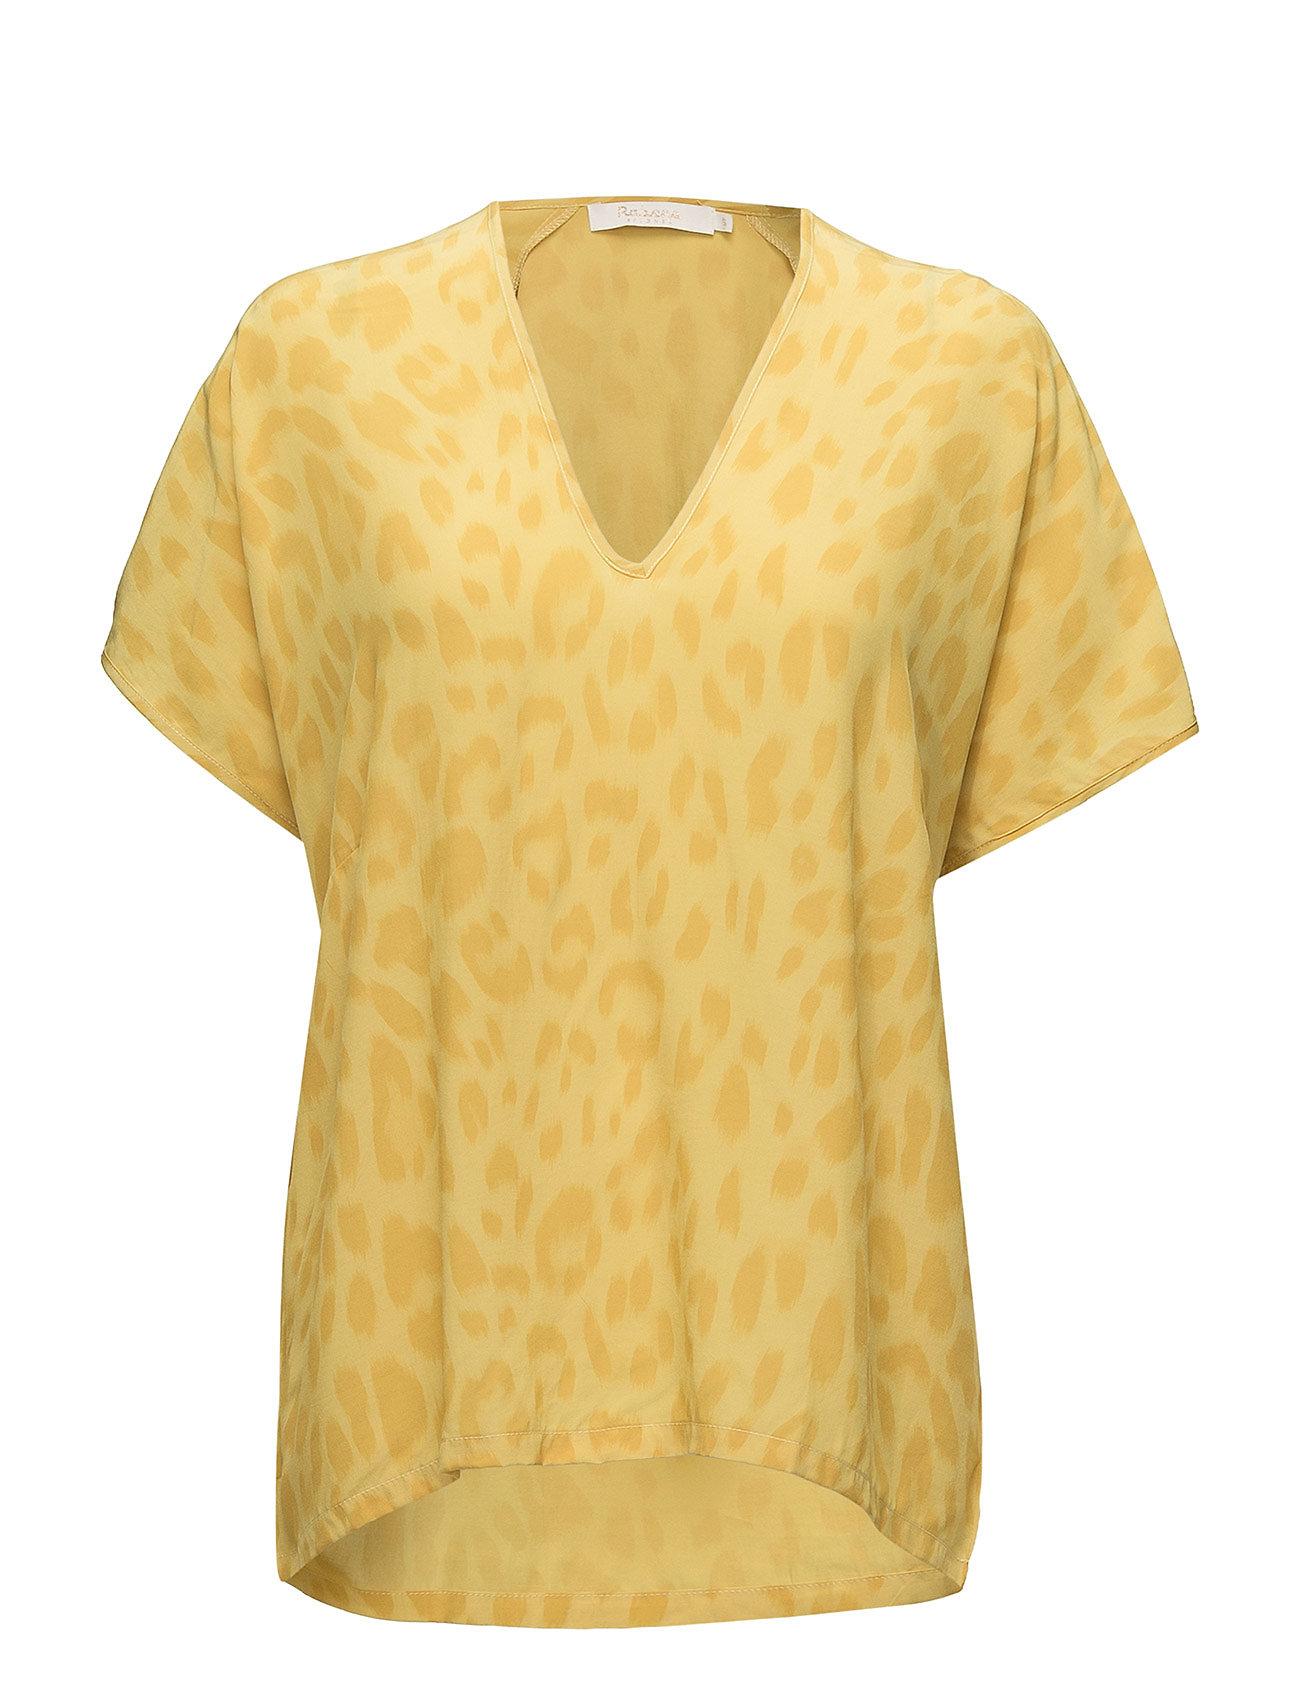 Rabens Saloner Bright leopard blouse - TURMERIC